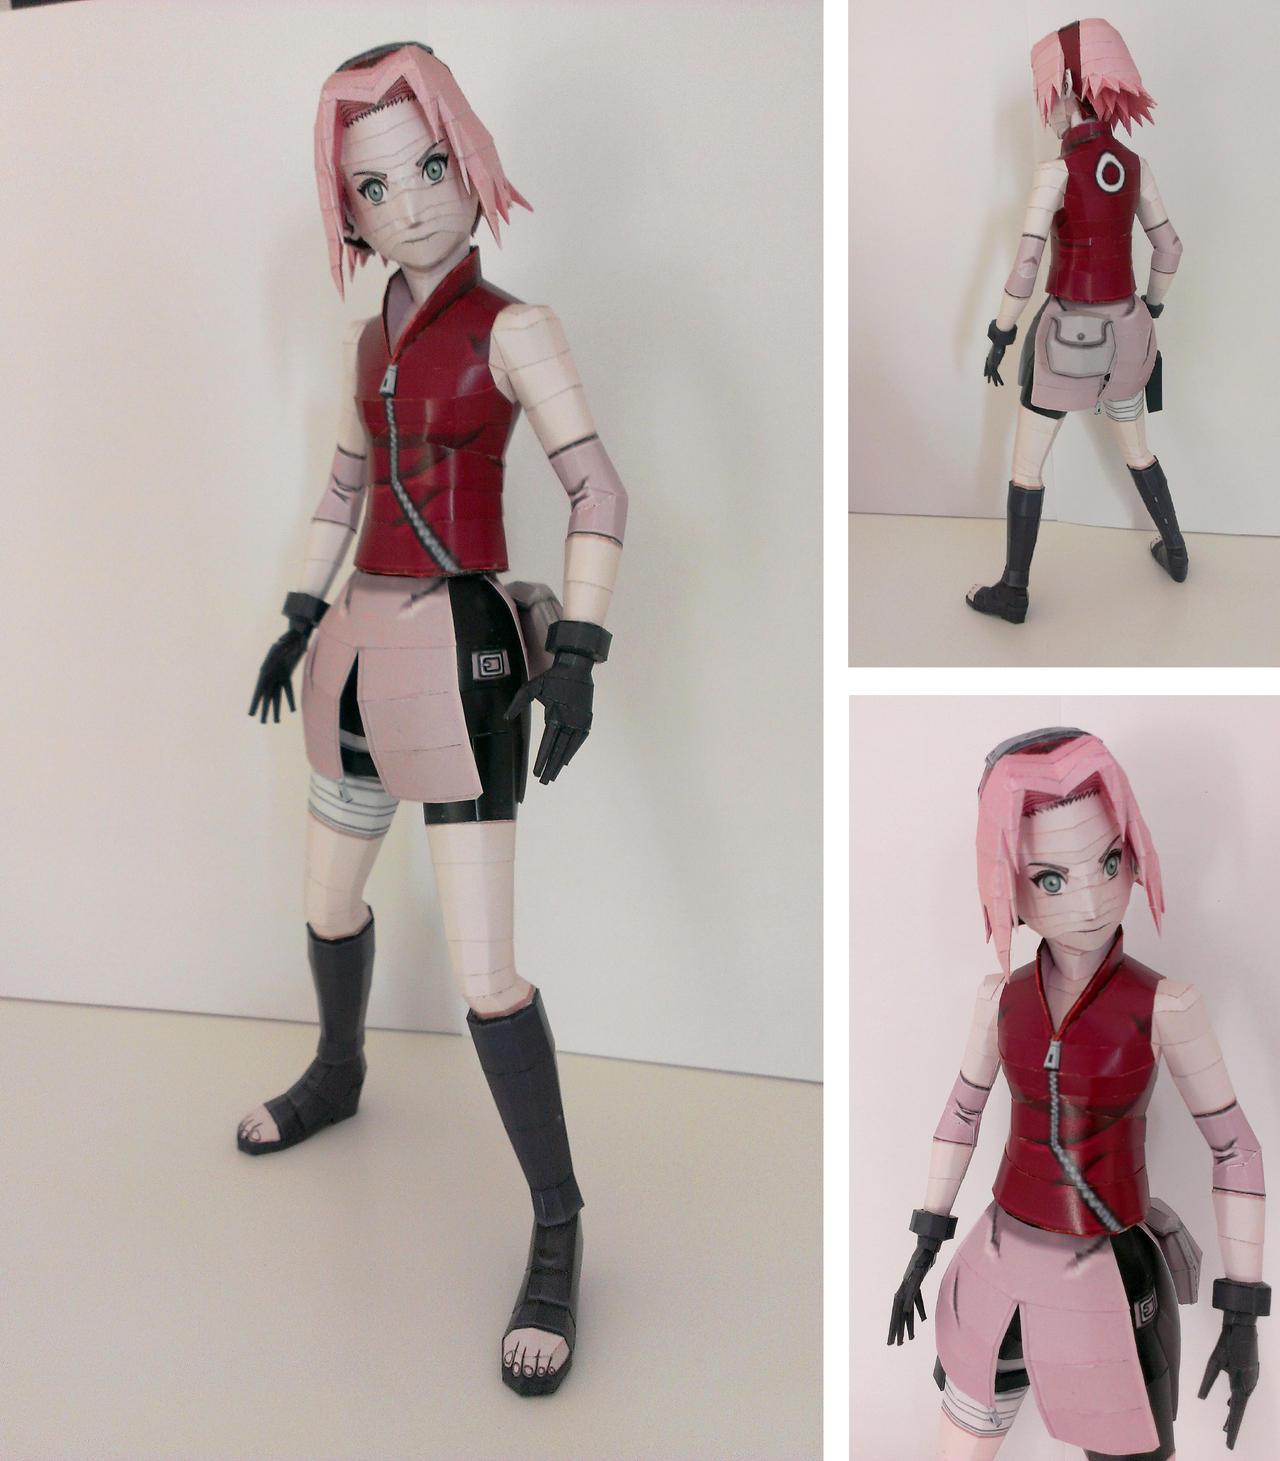 Sakura papercraft by Marlous2604